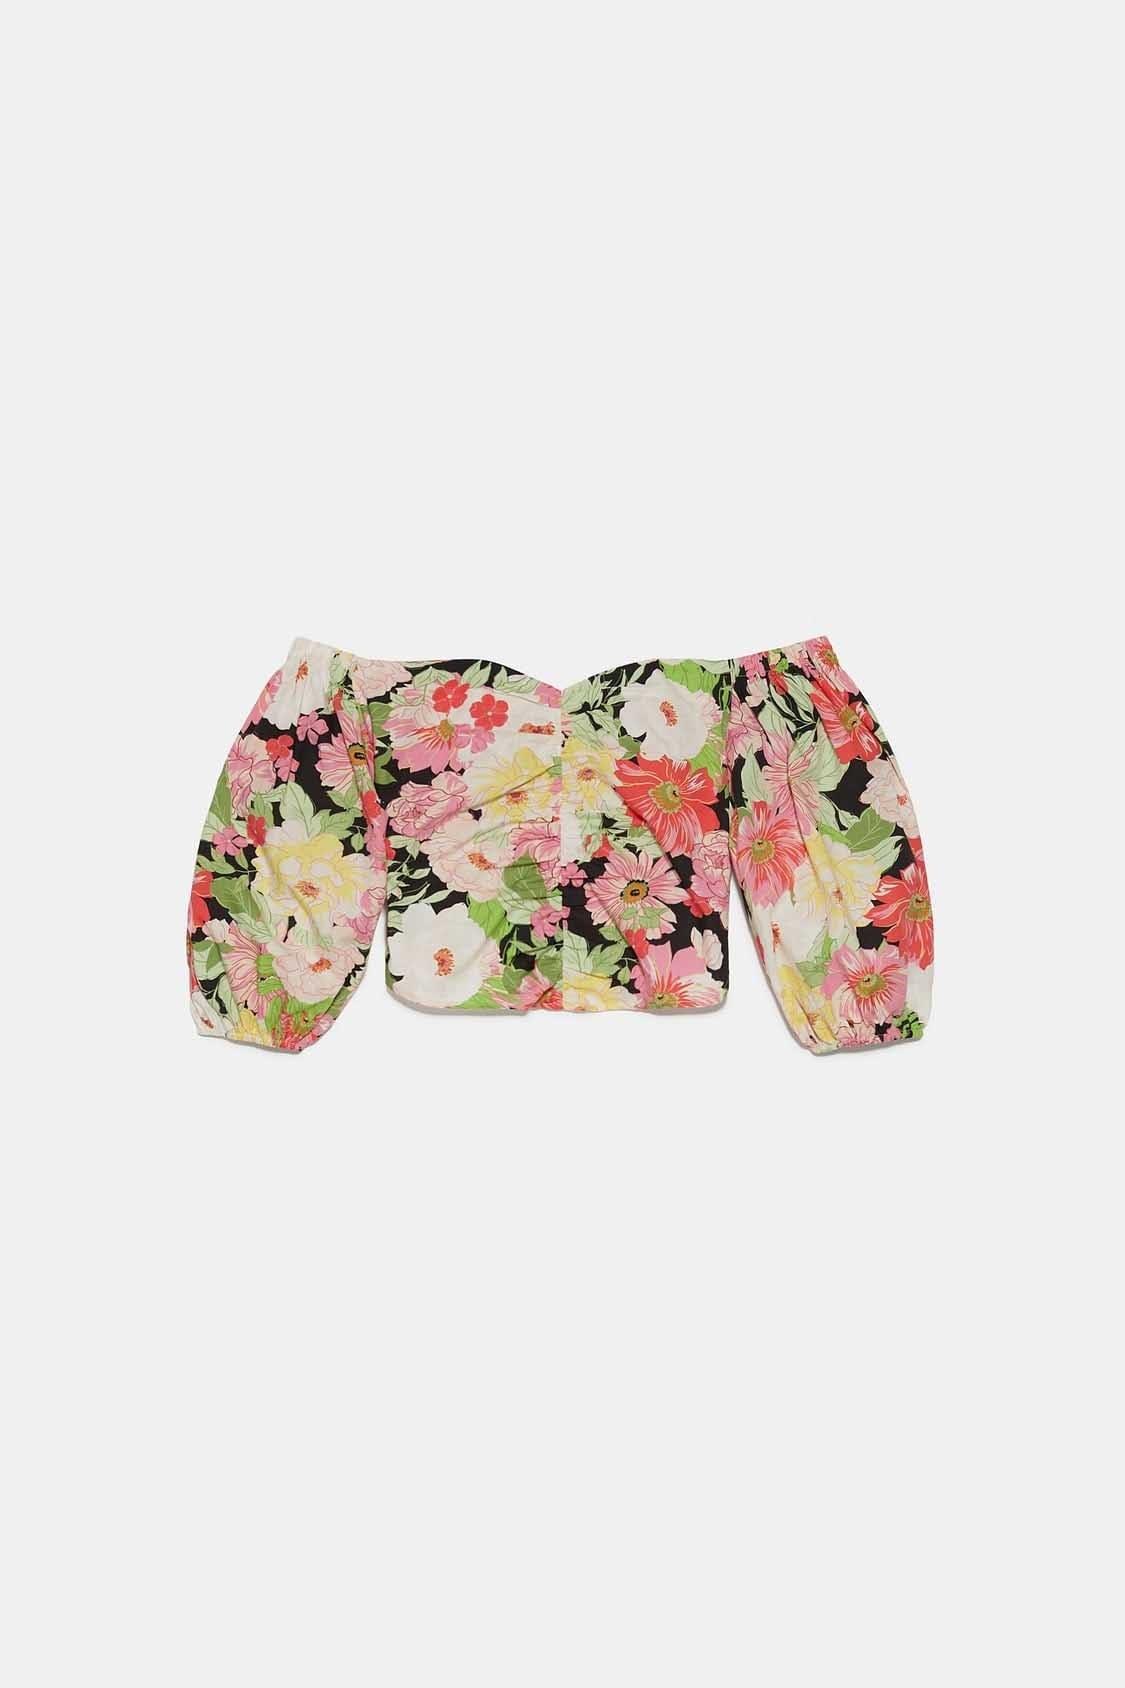 تصویر بلوز نیم تنه زنانه گل گلی زارا کد: Çokrenkli - 2788256